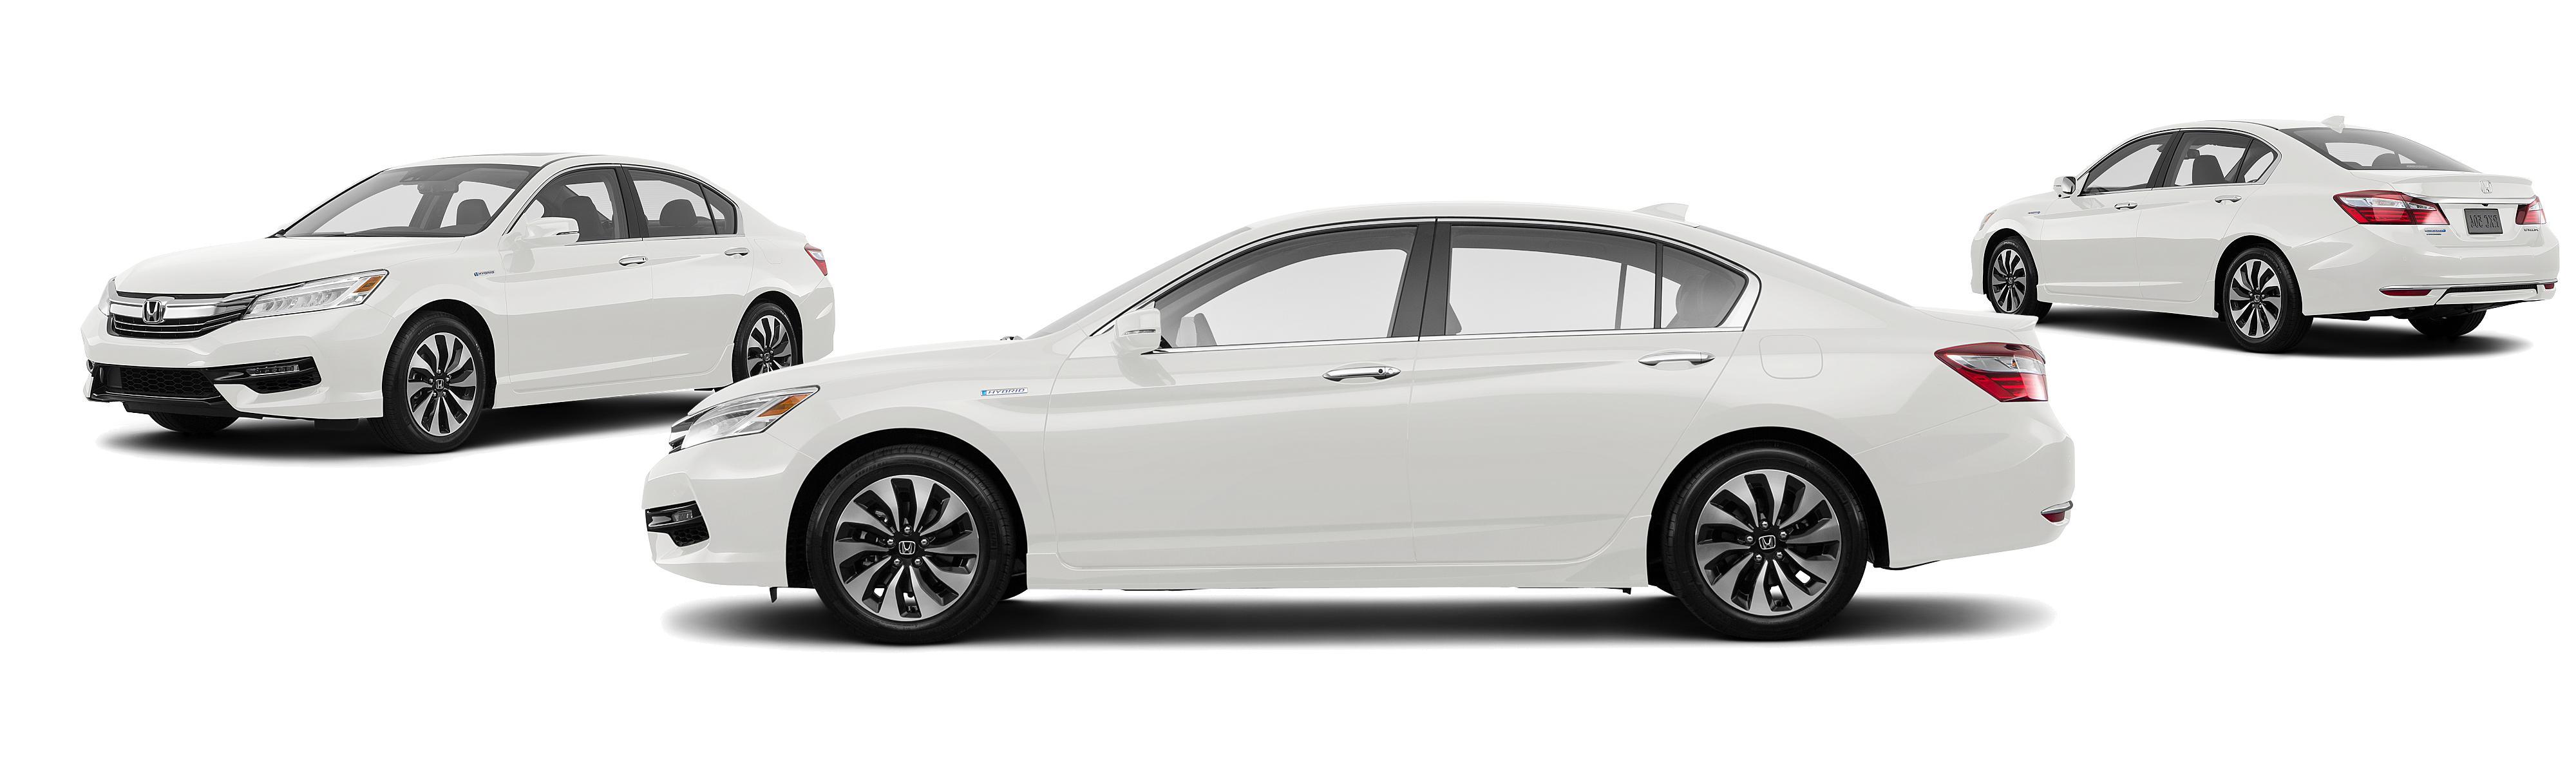 2017 Honda Accord Hybrid Touring 4dr Sedan Research GrooveCar